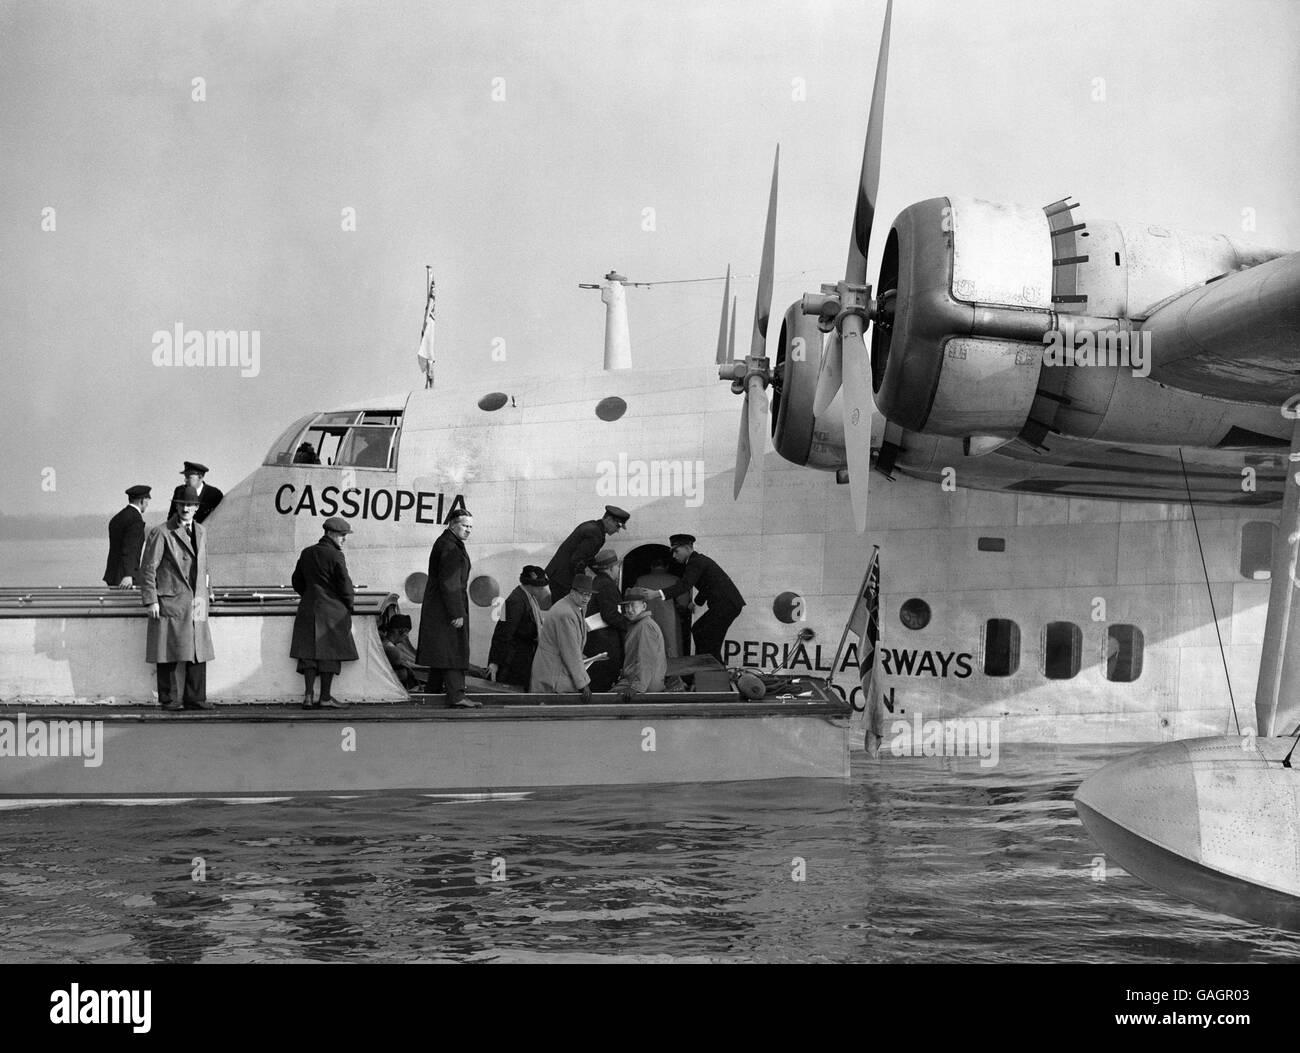 Aviation - Cassiopeia Maiden Flight - Southampton - Stock Image